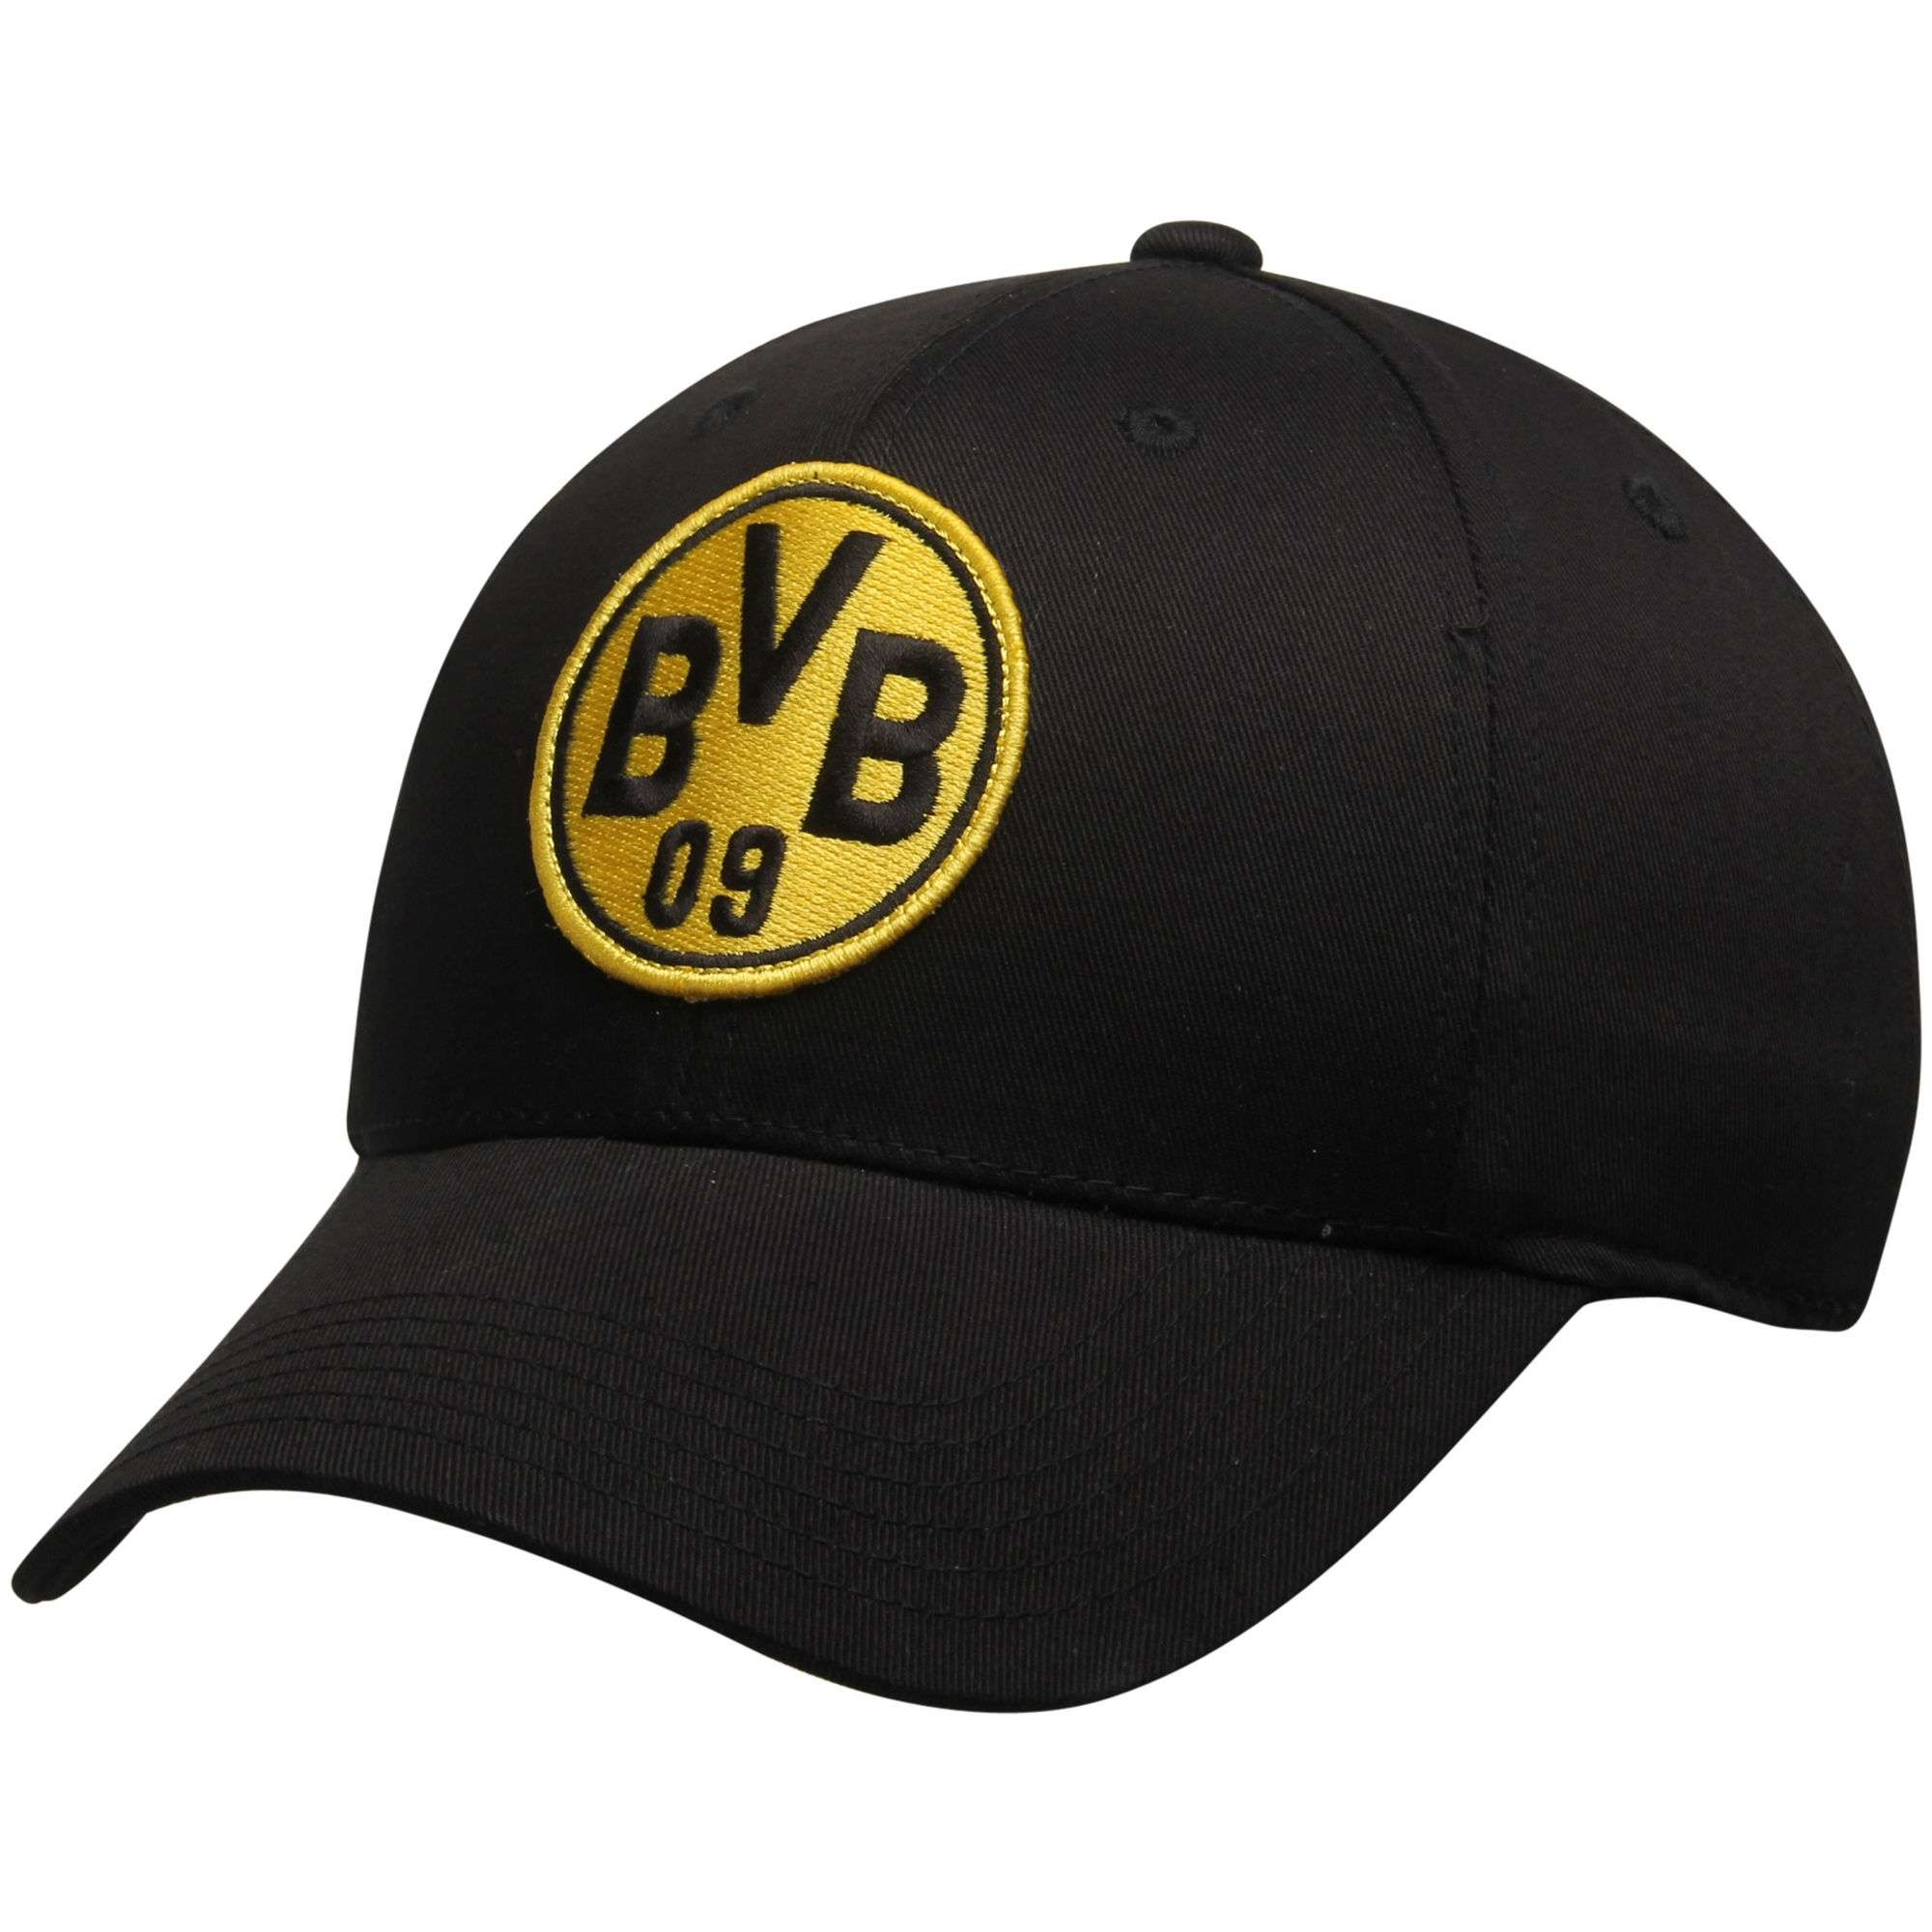 Hat: Soccer - Borussia Dortmund Photo